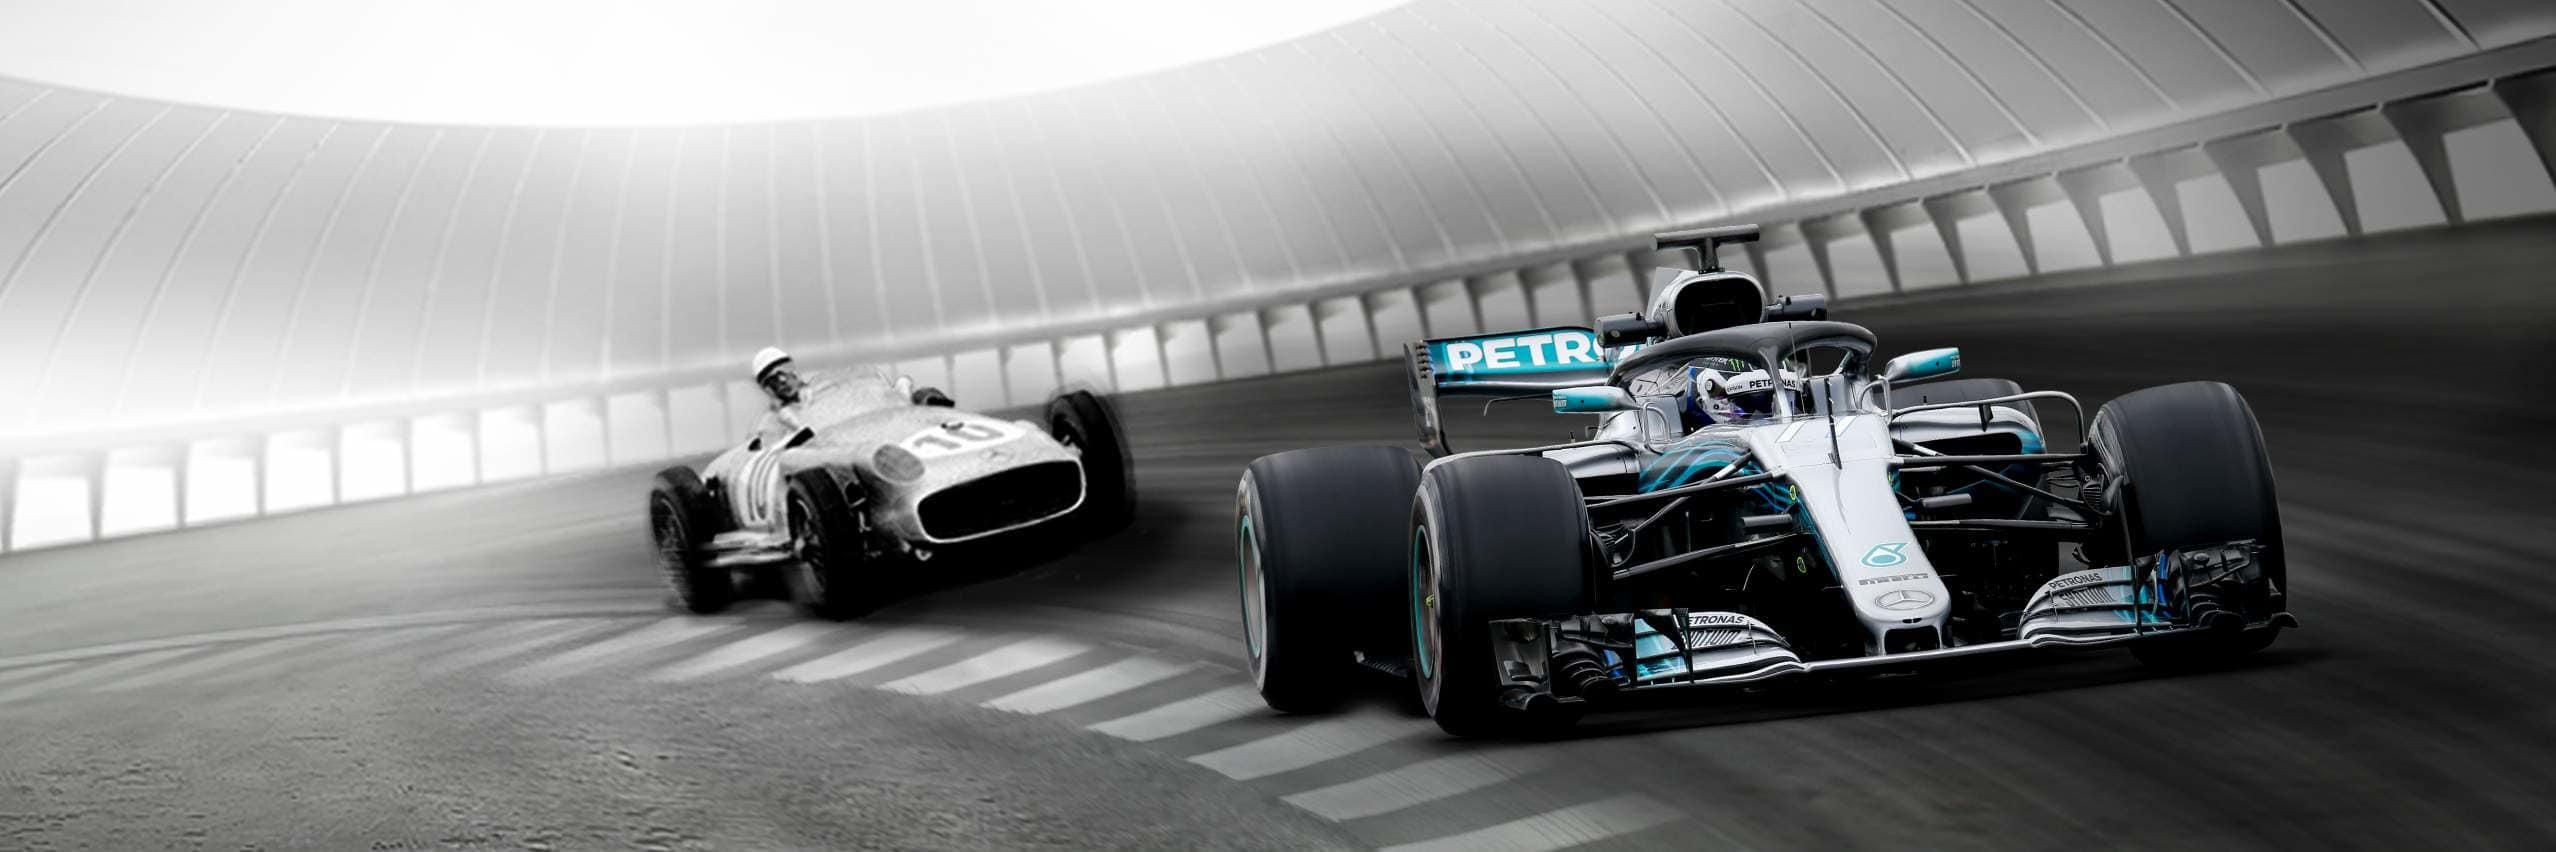 Mercedes-Benz в мире спорта